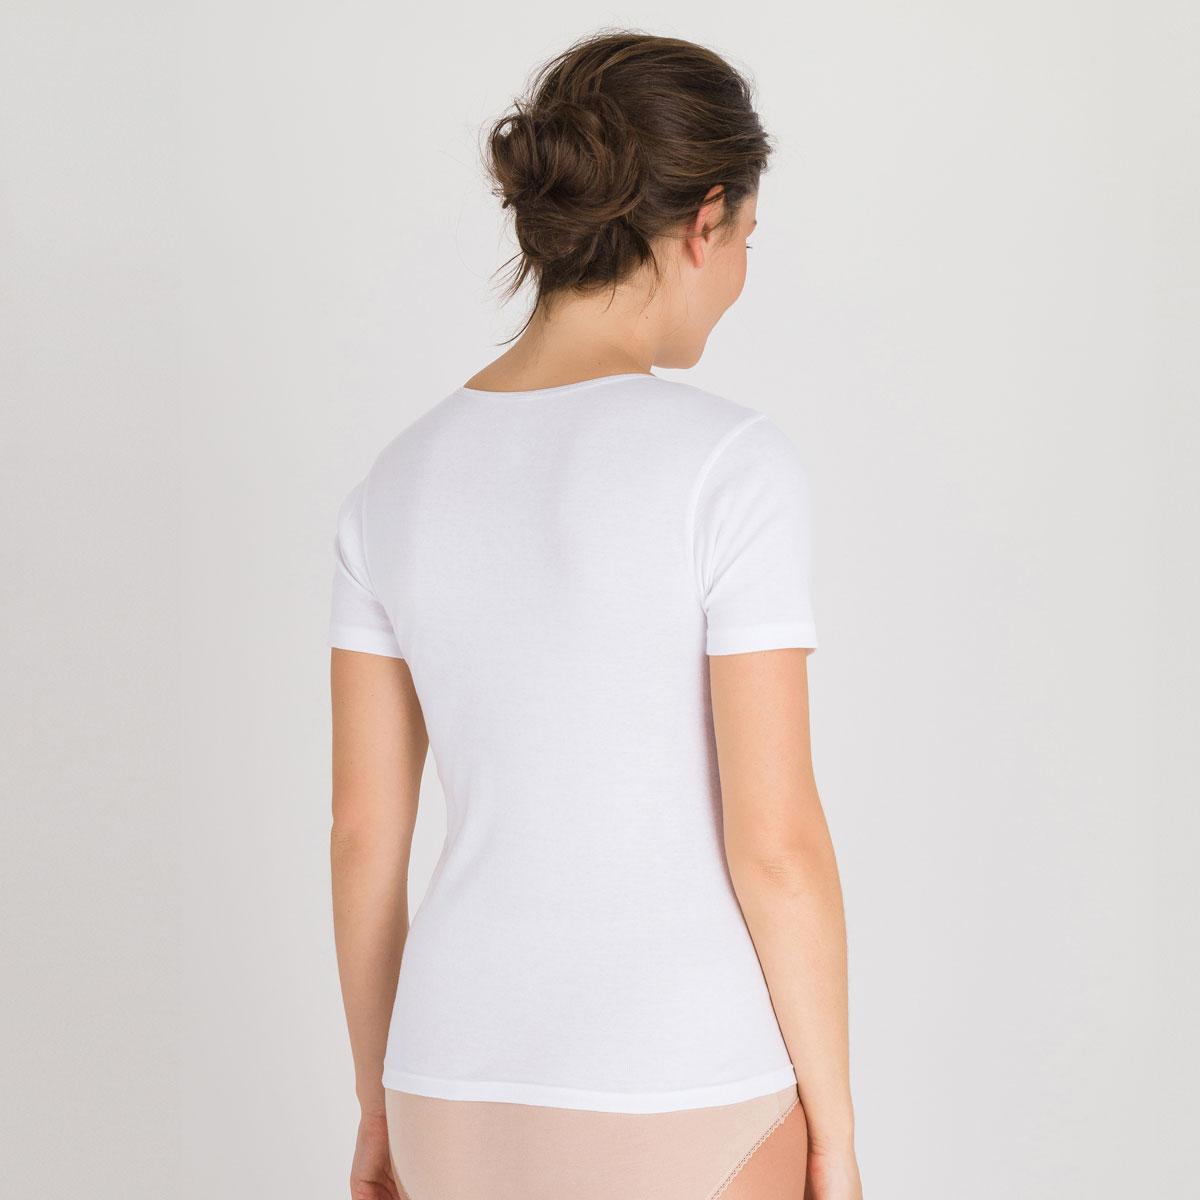 Top manches courtes blanc - Cotton Feminine-PLAYTEX